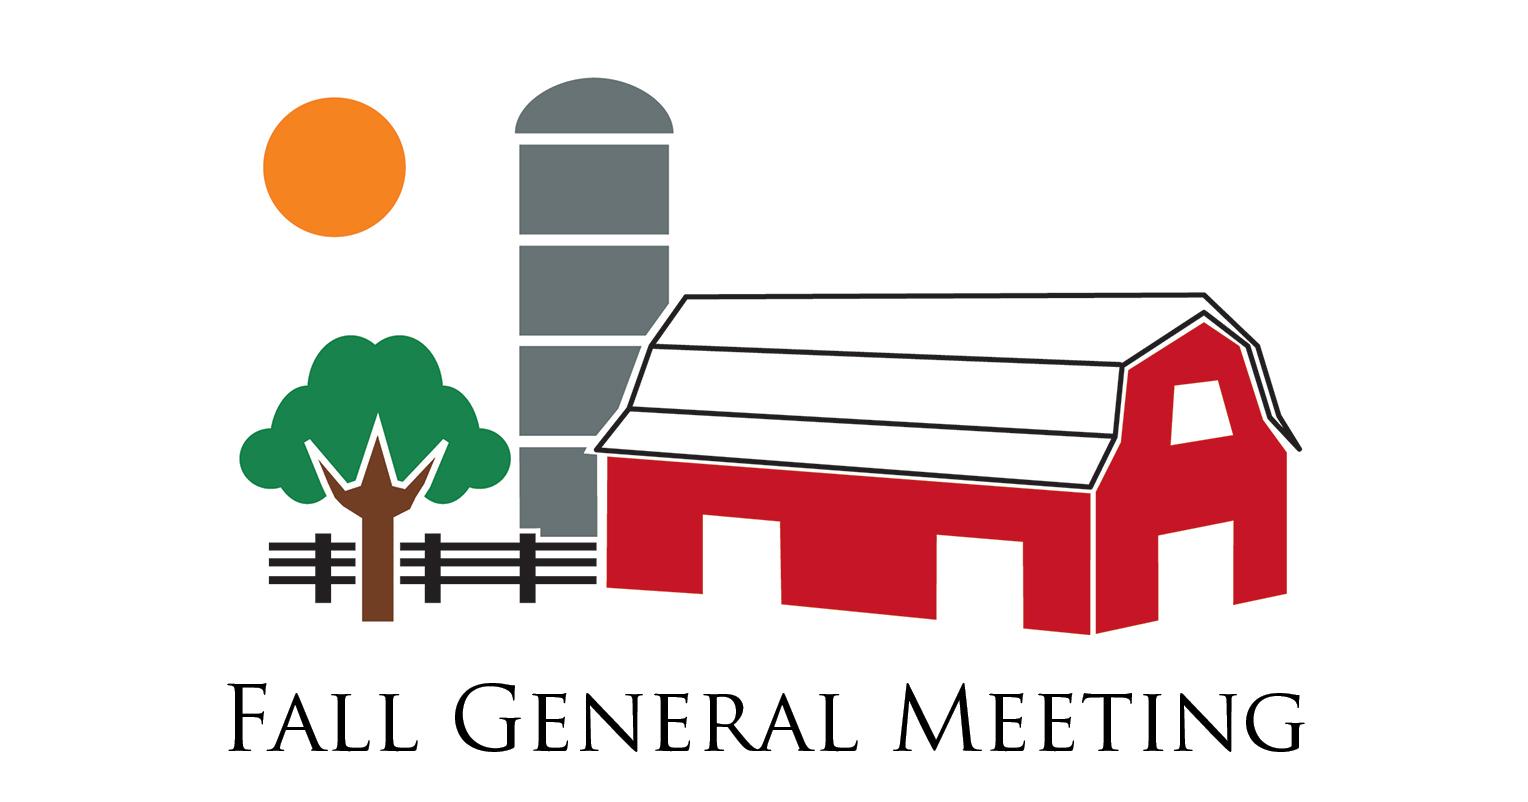 Fall 2019 General Meeting Roundup